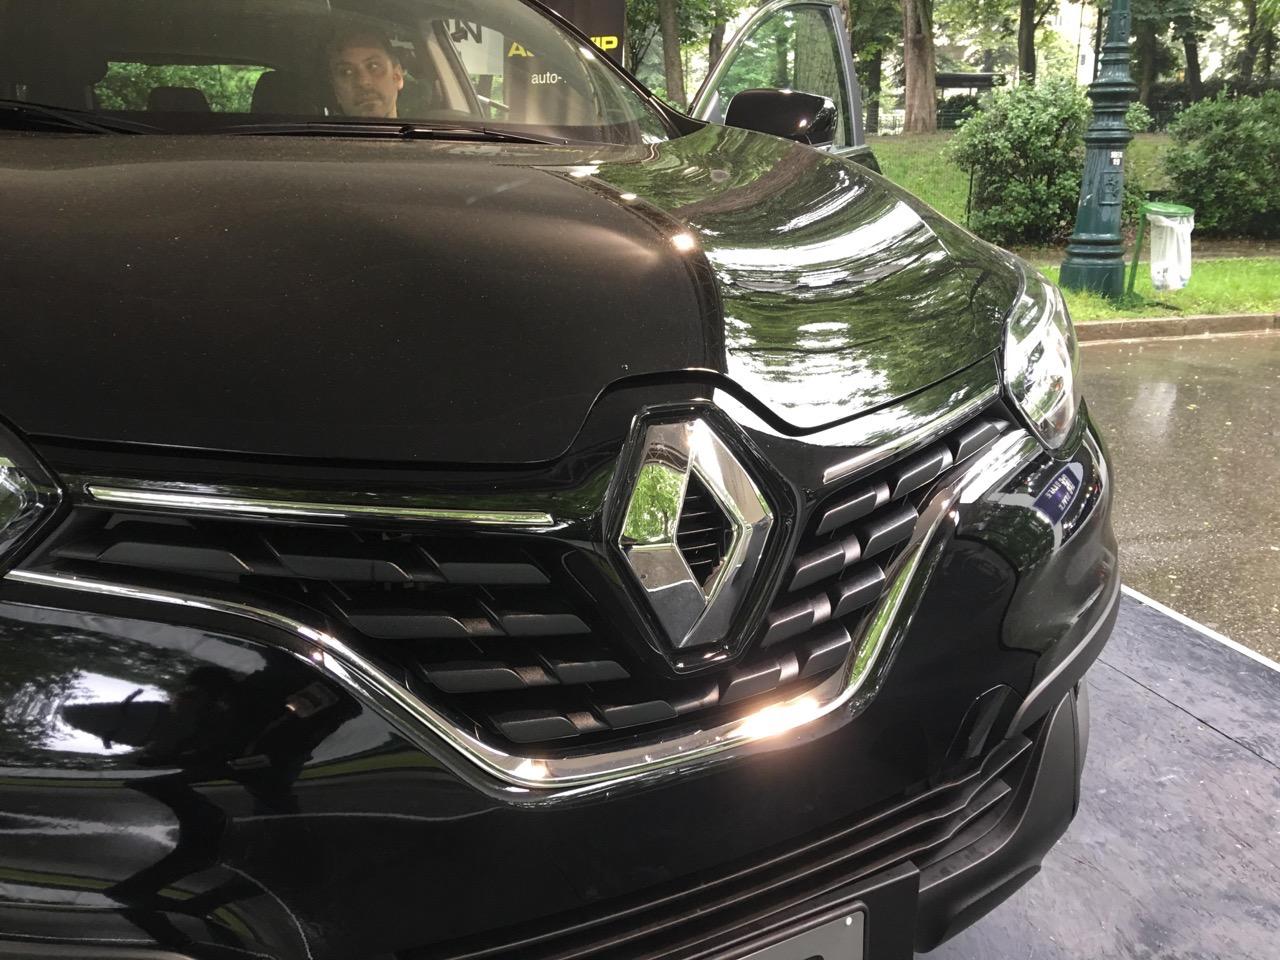 Renault - Parco Valentino 2018